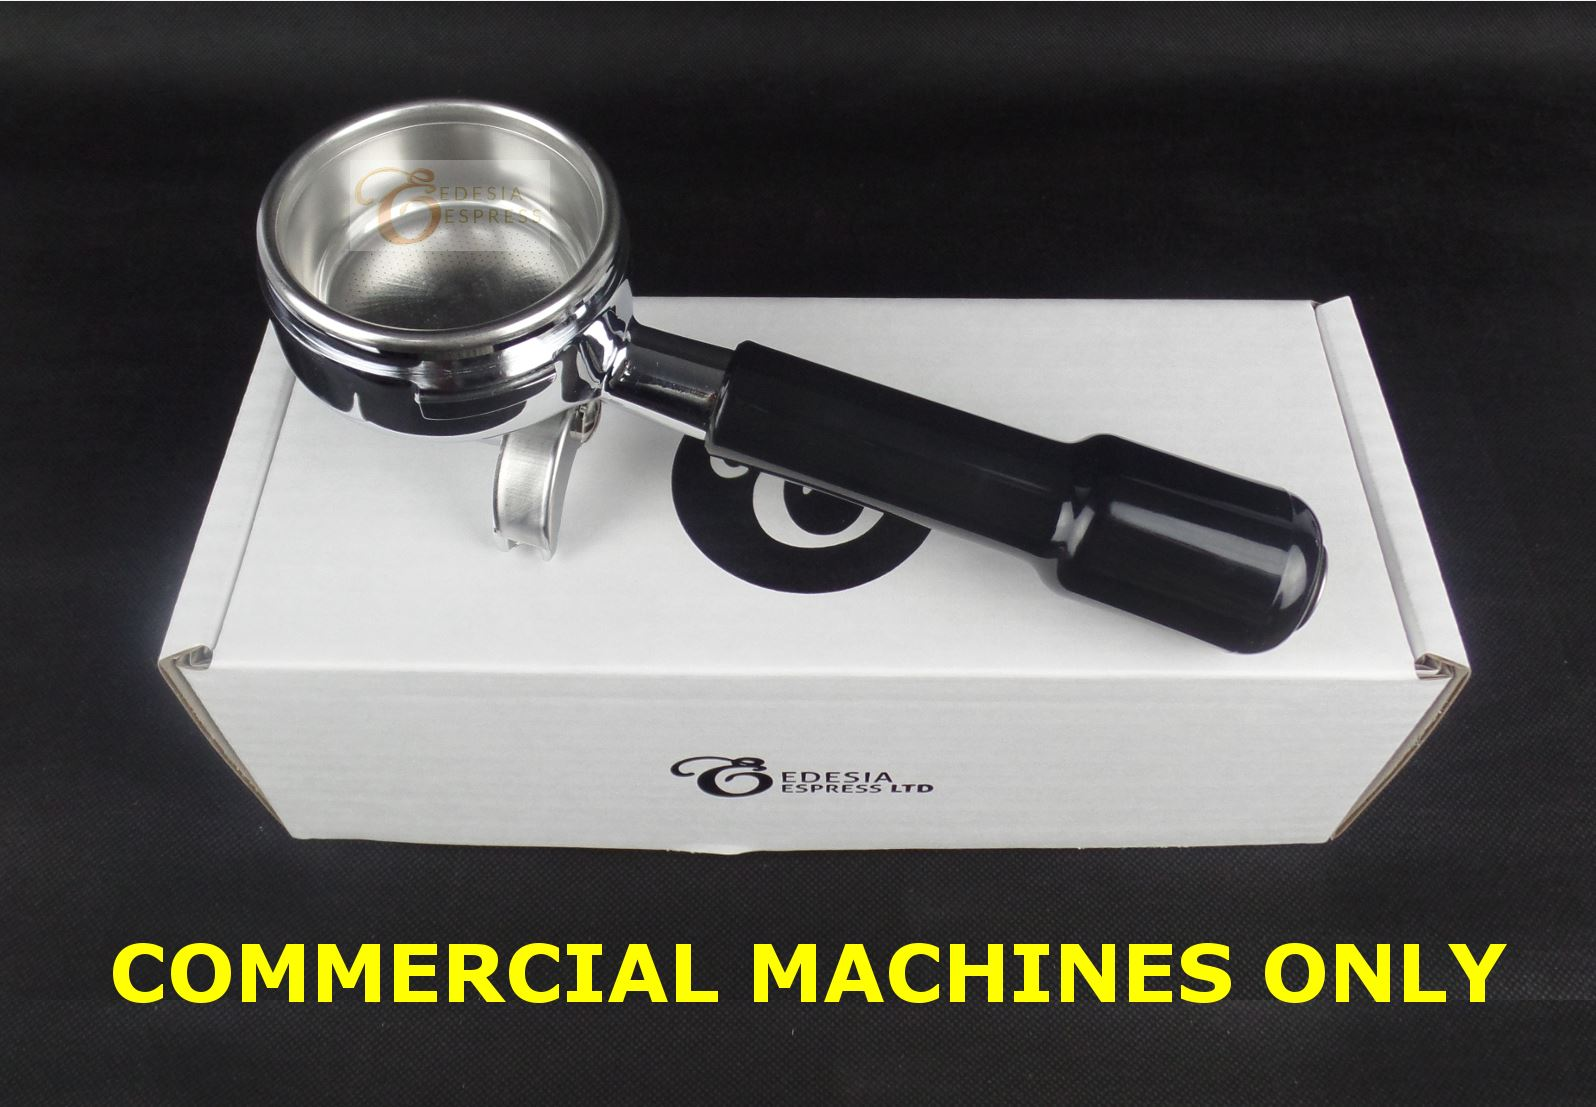 Double spout to fit most commerical espresso machines portafilter handle